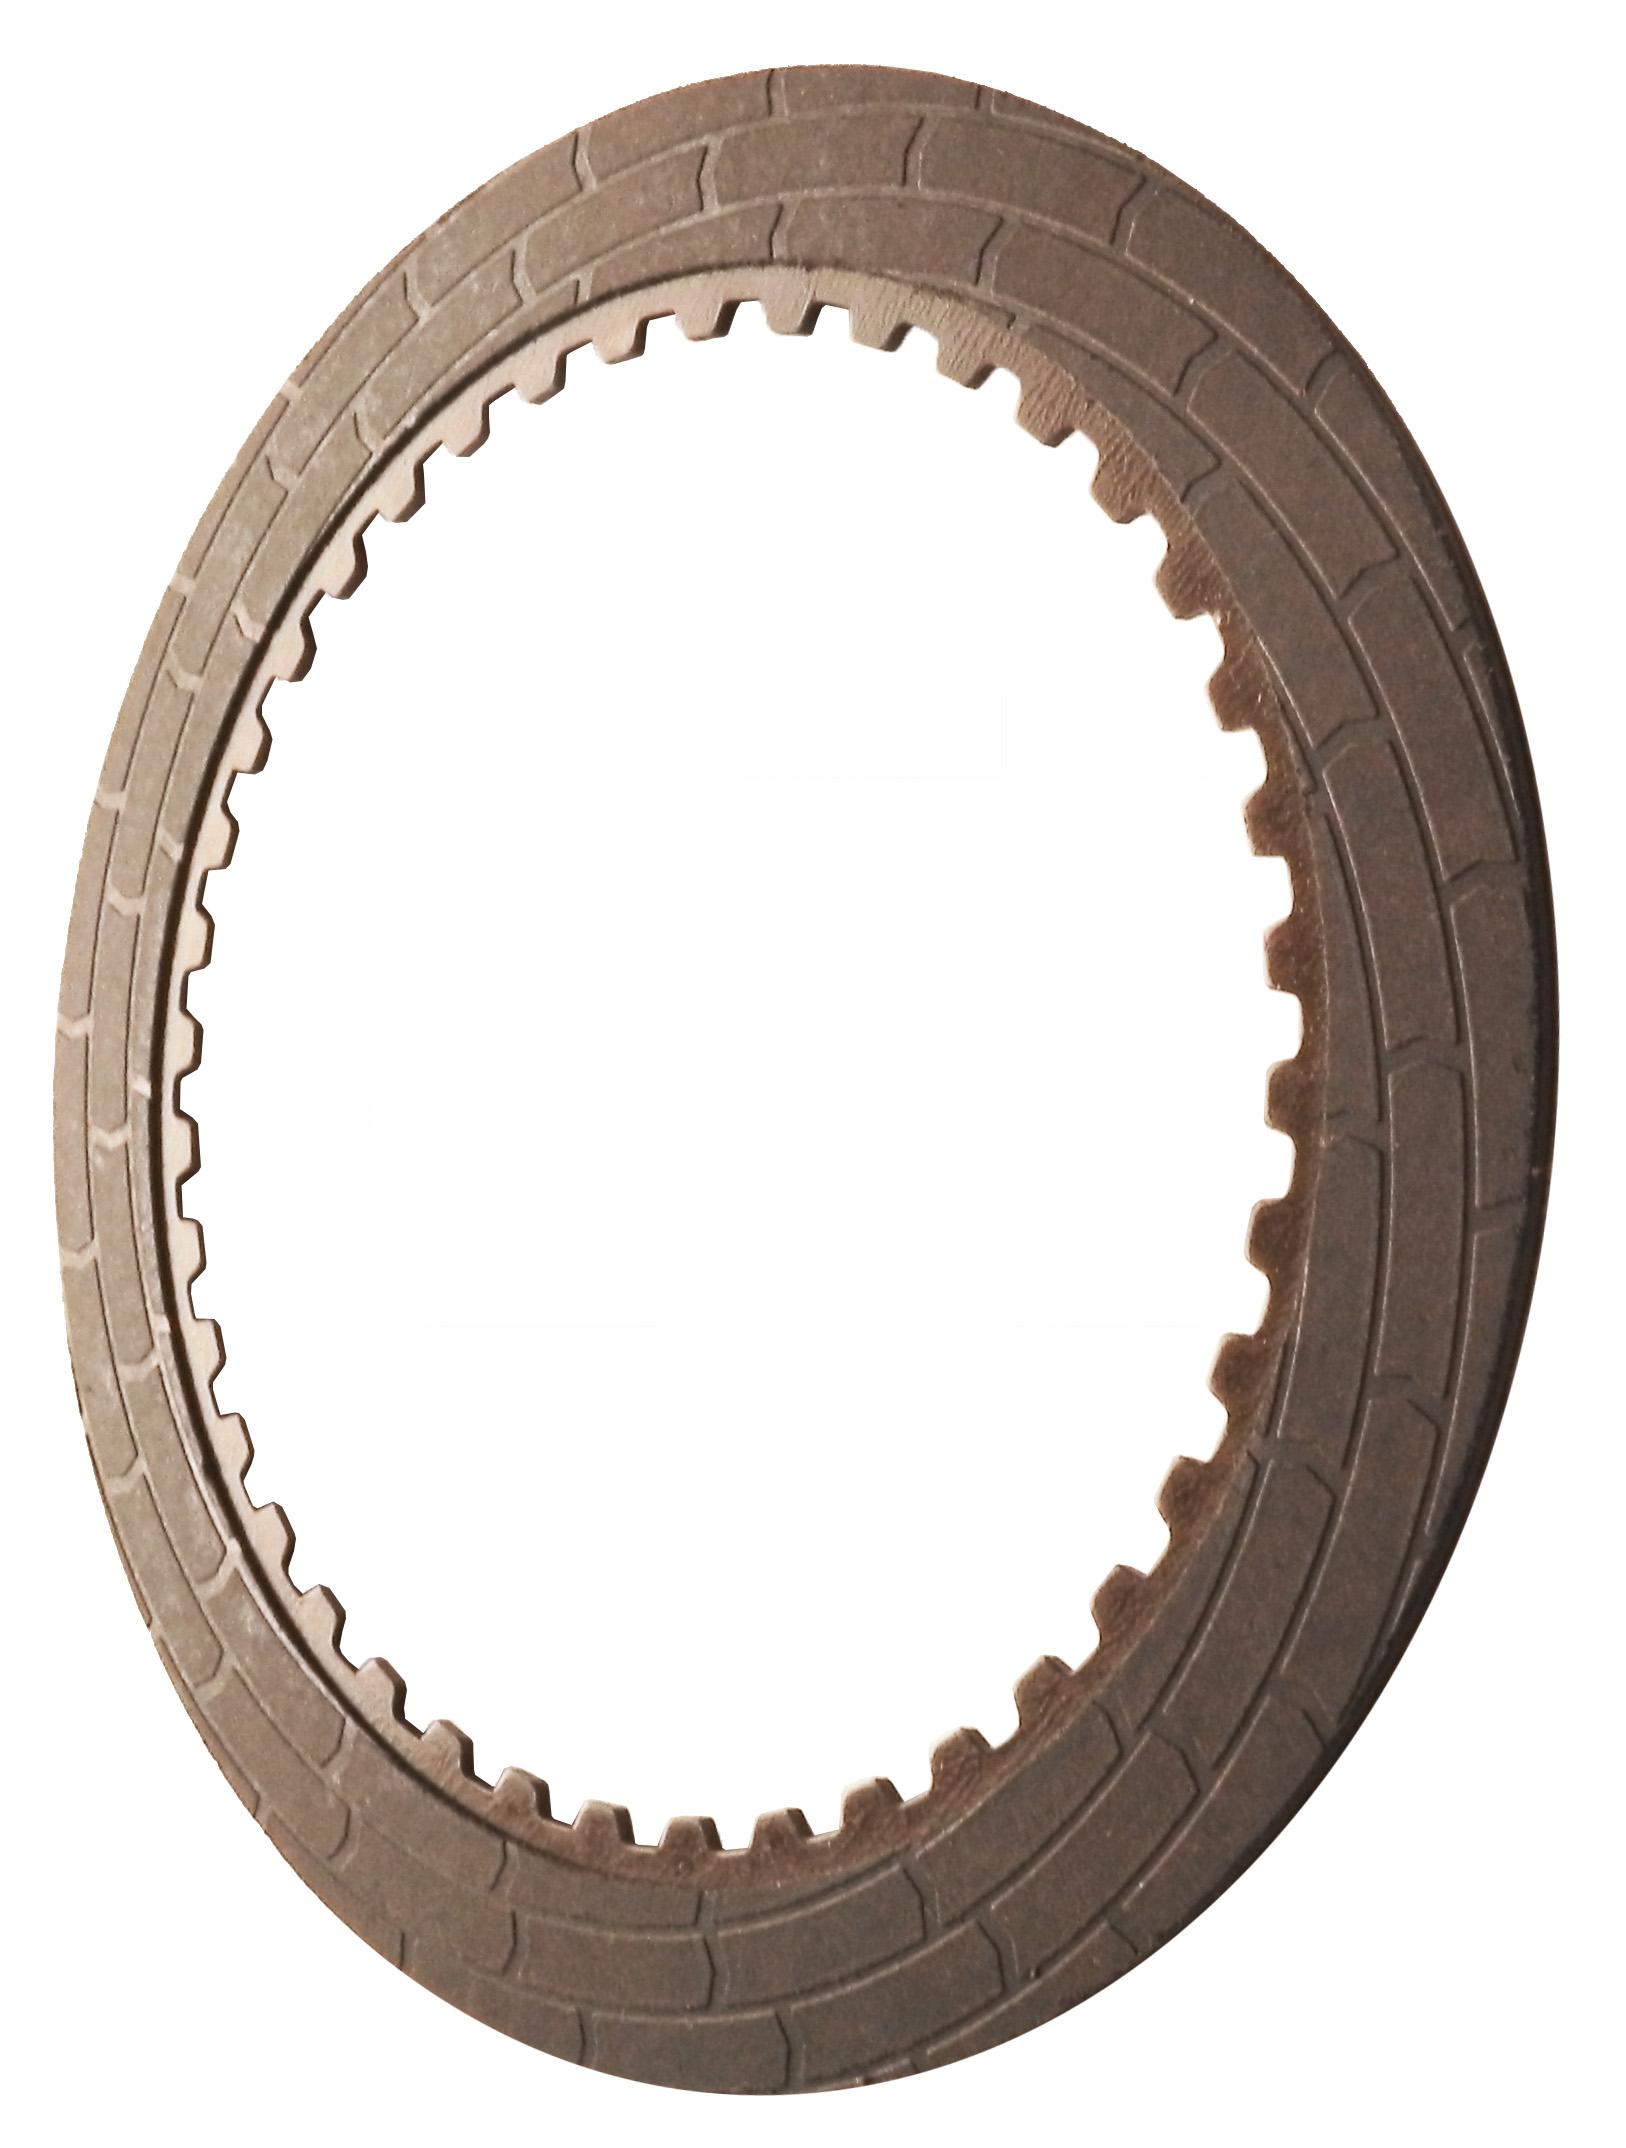 RH561315 | 1990-ON Friction Clutch Plate (HT) Hybrid Technology Overrun Clutch Proprietary High Energy (HT)